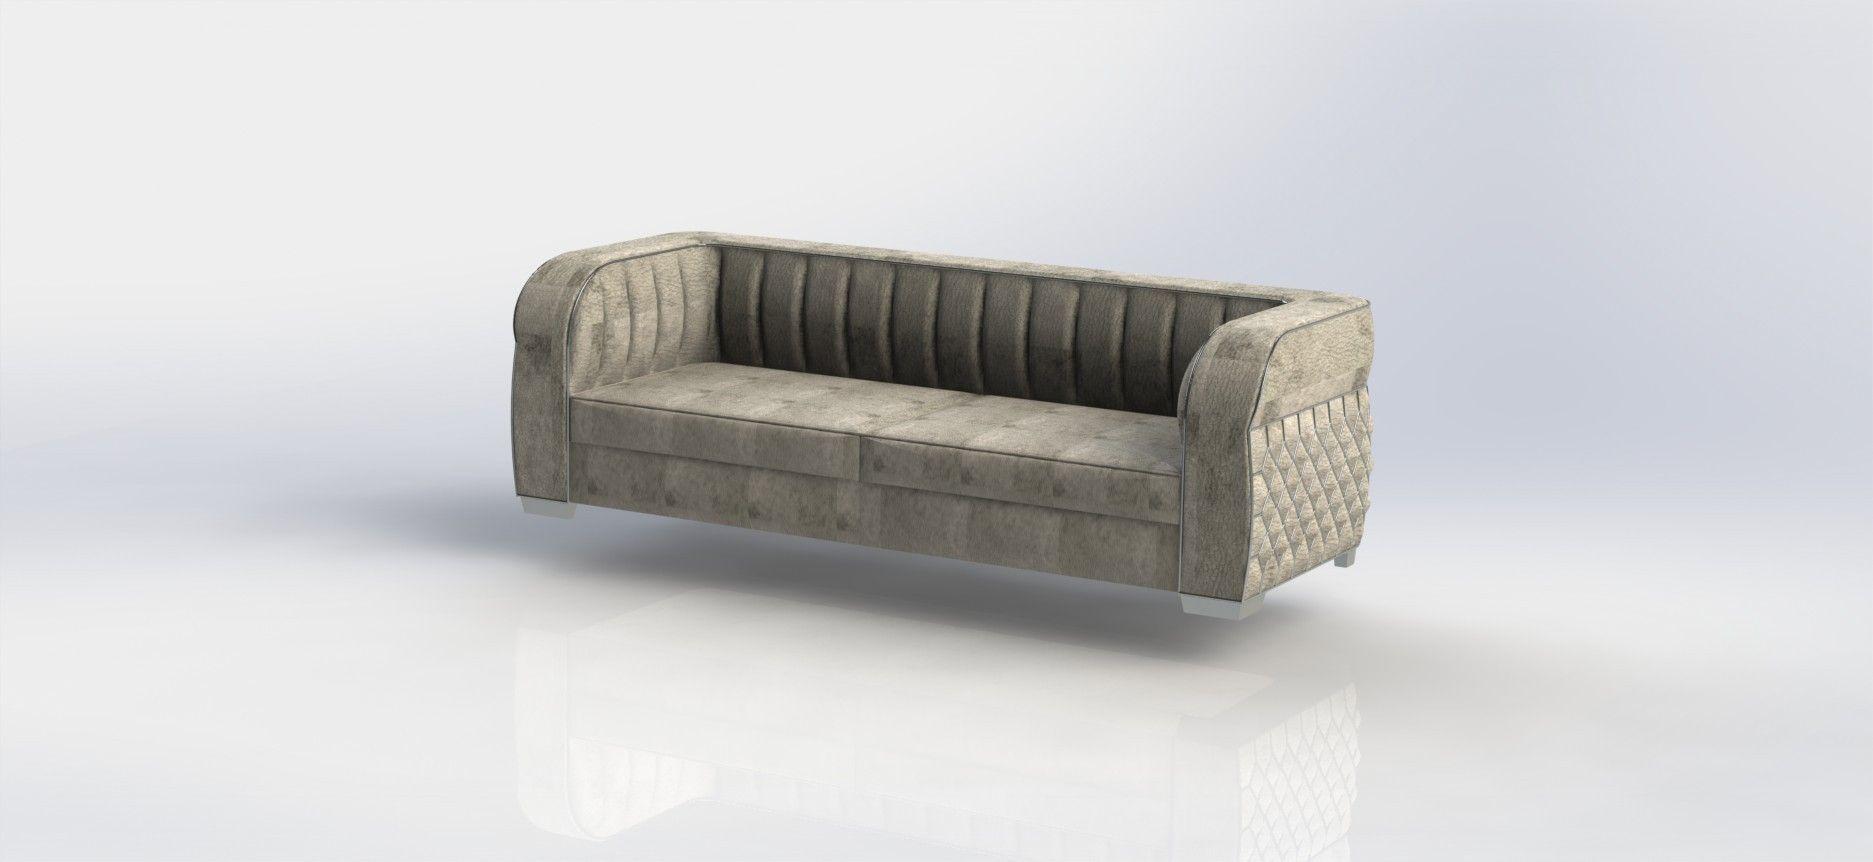 Art Deco Sofa 3d Model Stl Dwg Sldprt Sldasm Slddrw Ige Igs Iges 1 ...